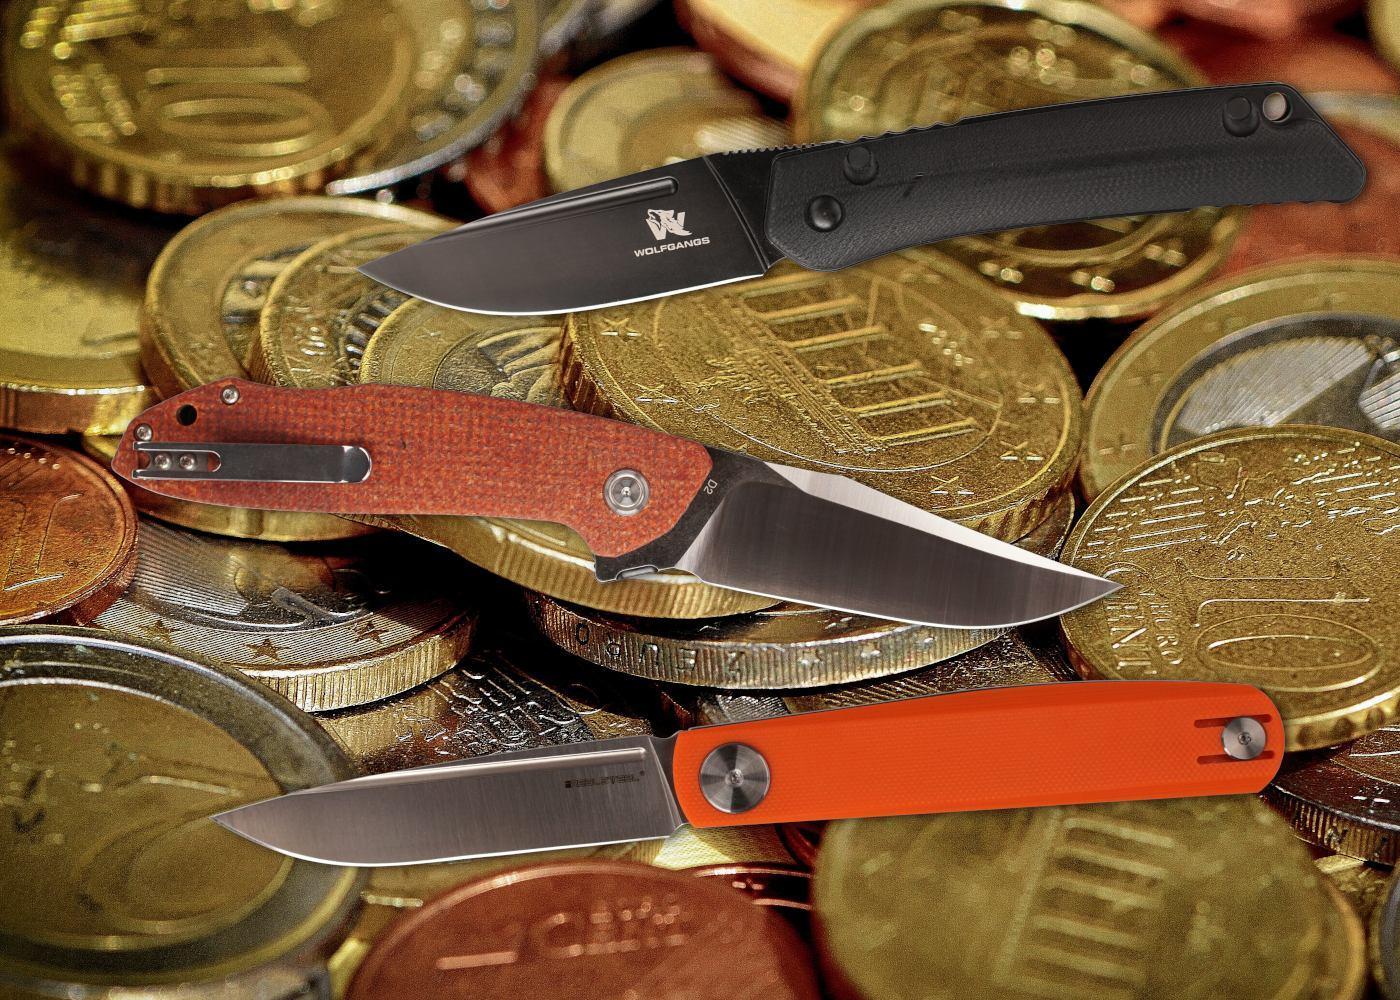 Preiswerte Messer - Budget Knives 2021